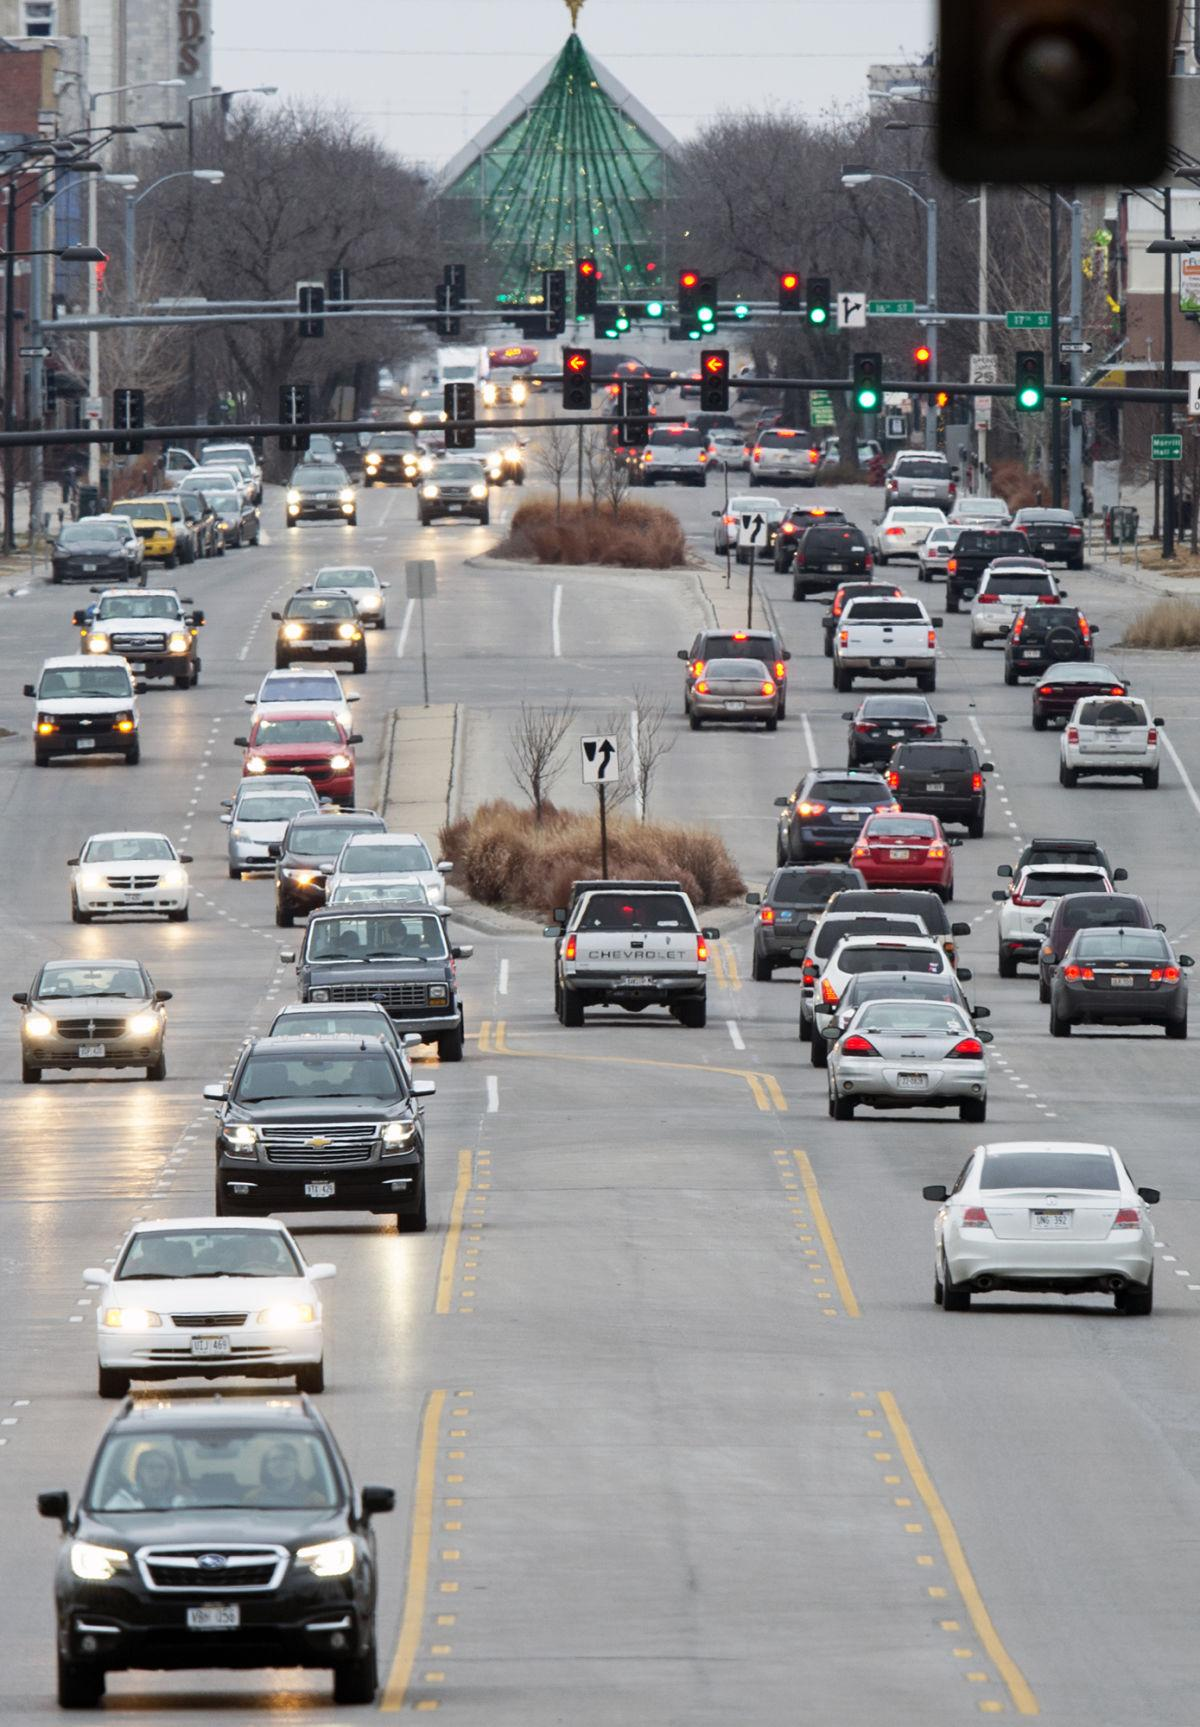 Traffic lights on O Street